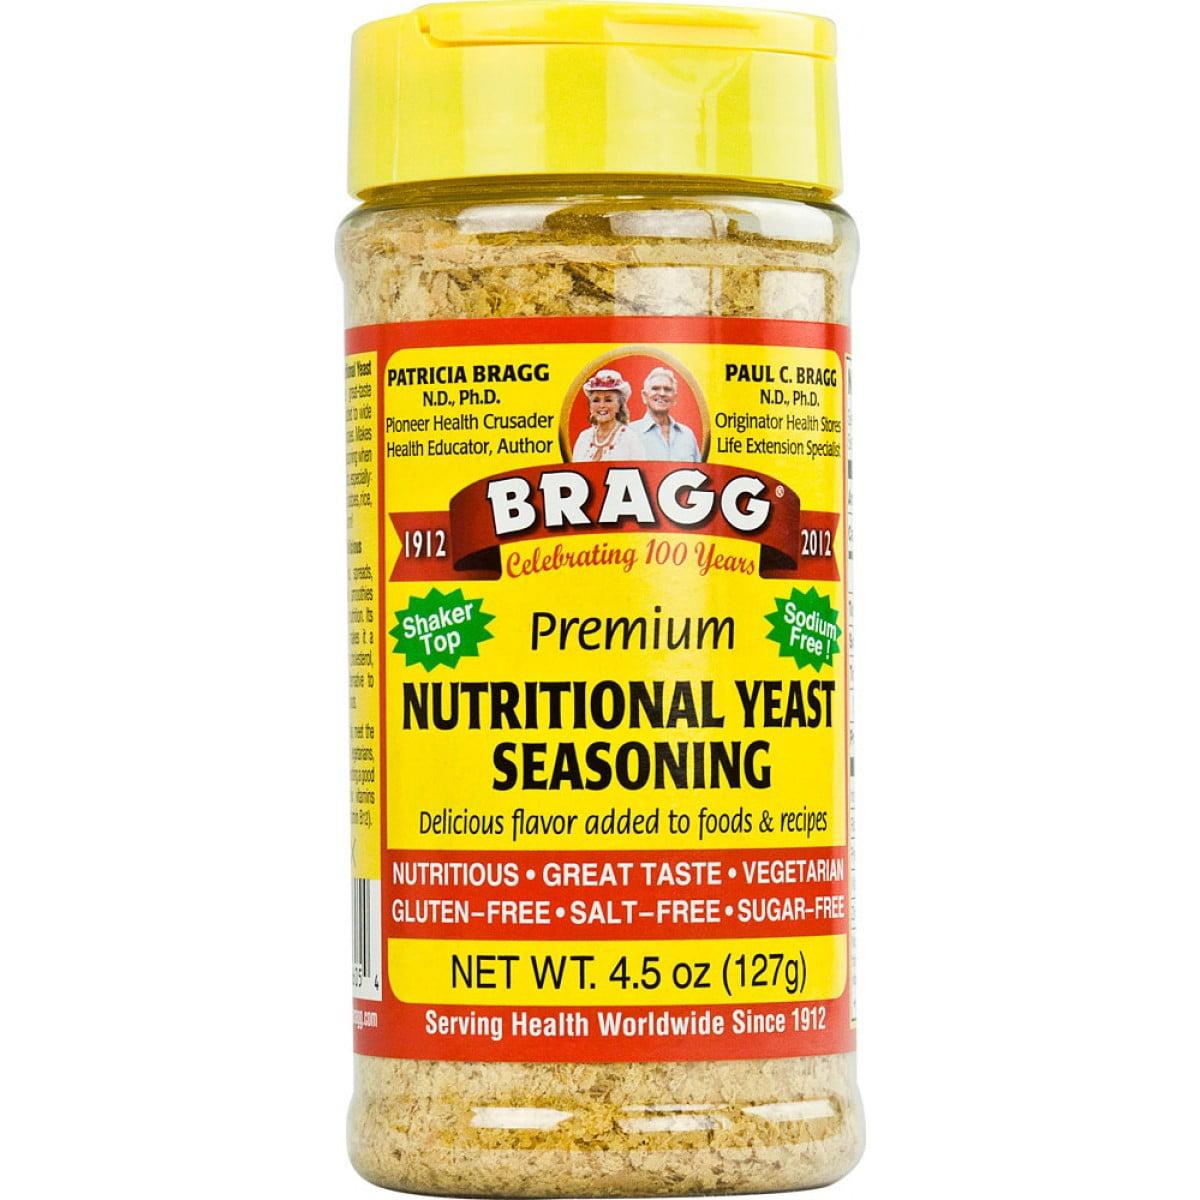 Bragg Premium Sodium Free Nutritional Yeast Seasoning, 4.5 OZ by Bragg